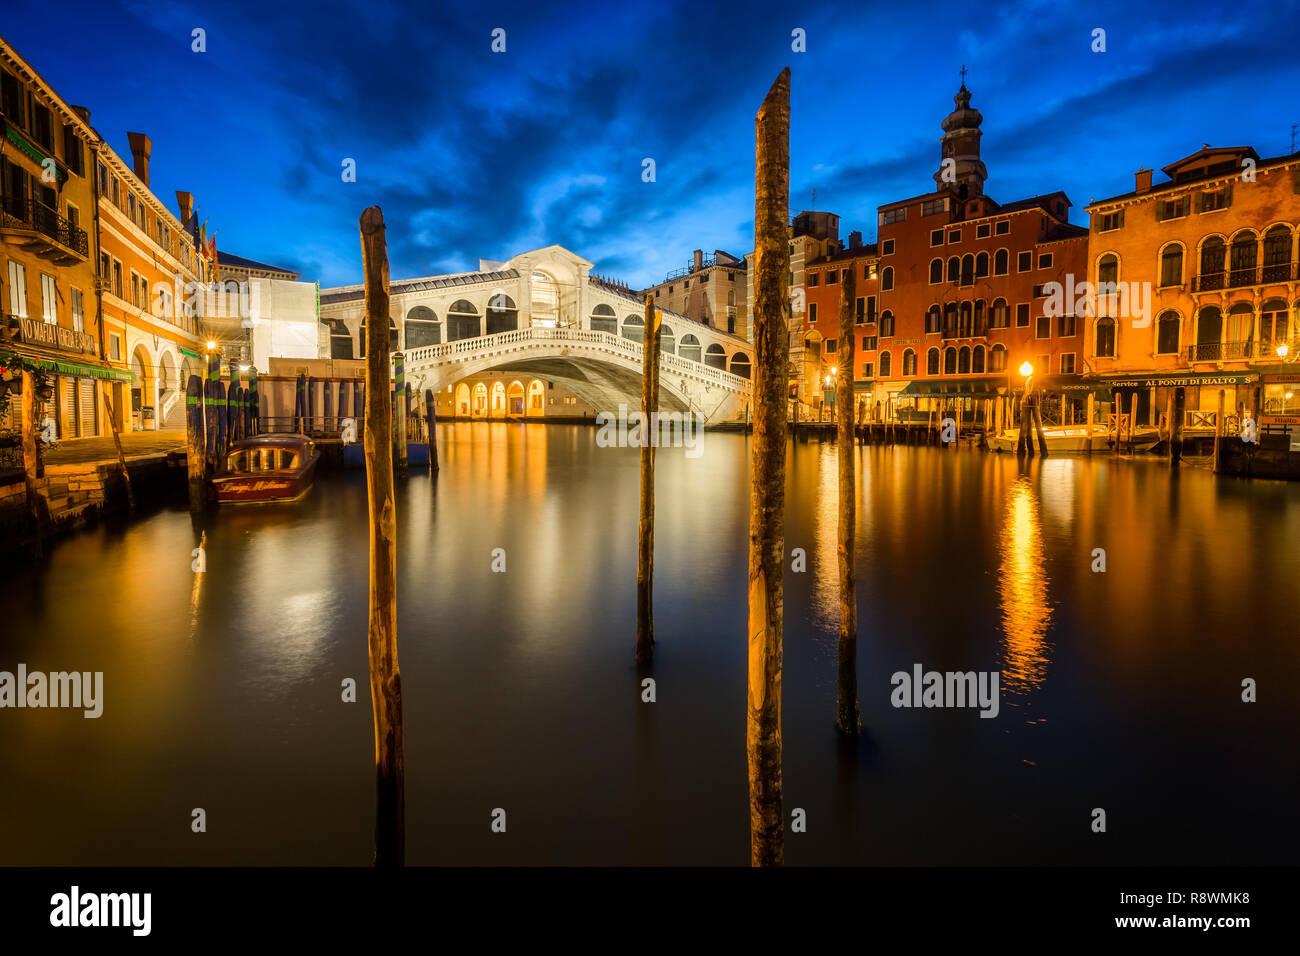 Ponte Rialto, Venice, Italy - Stock Image